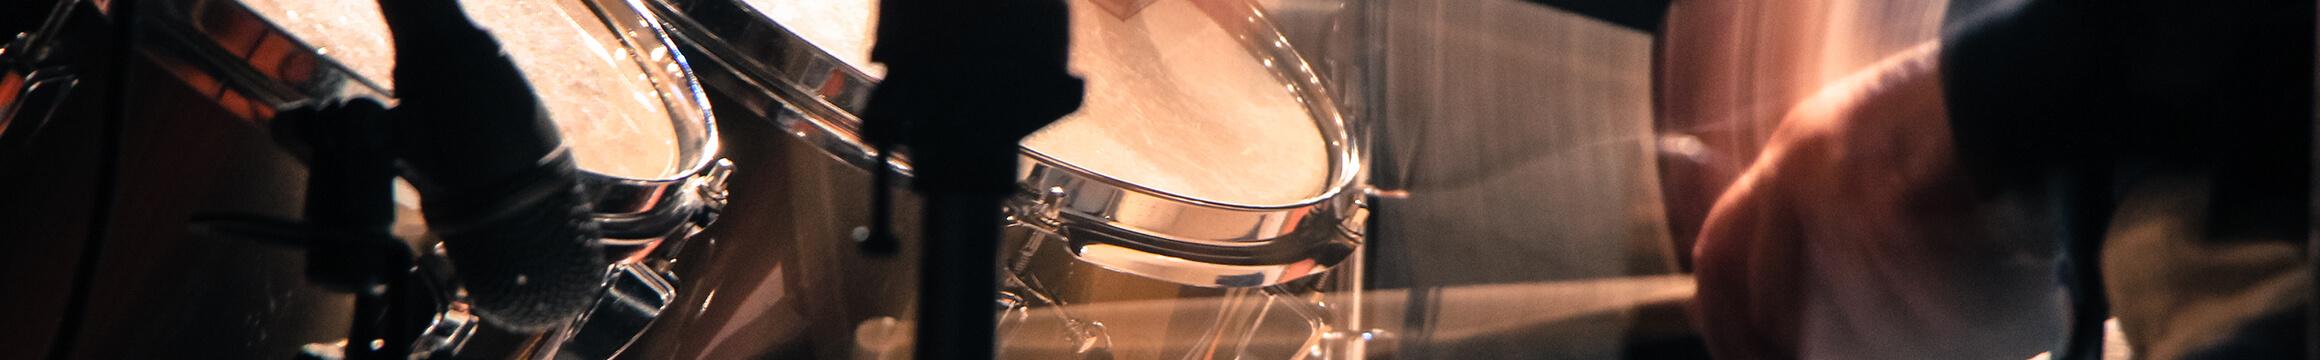 Music 18